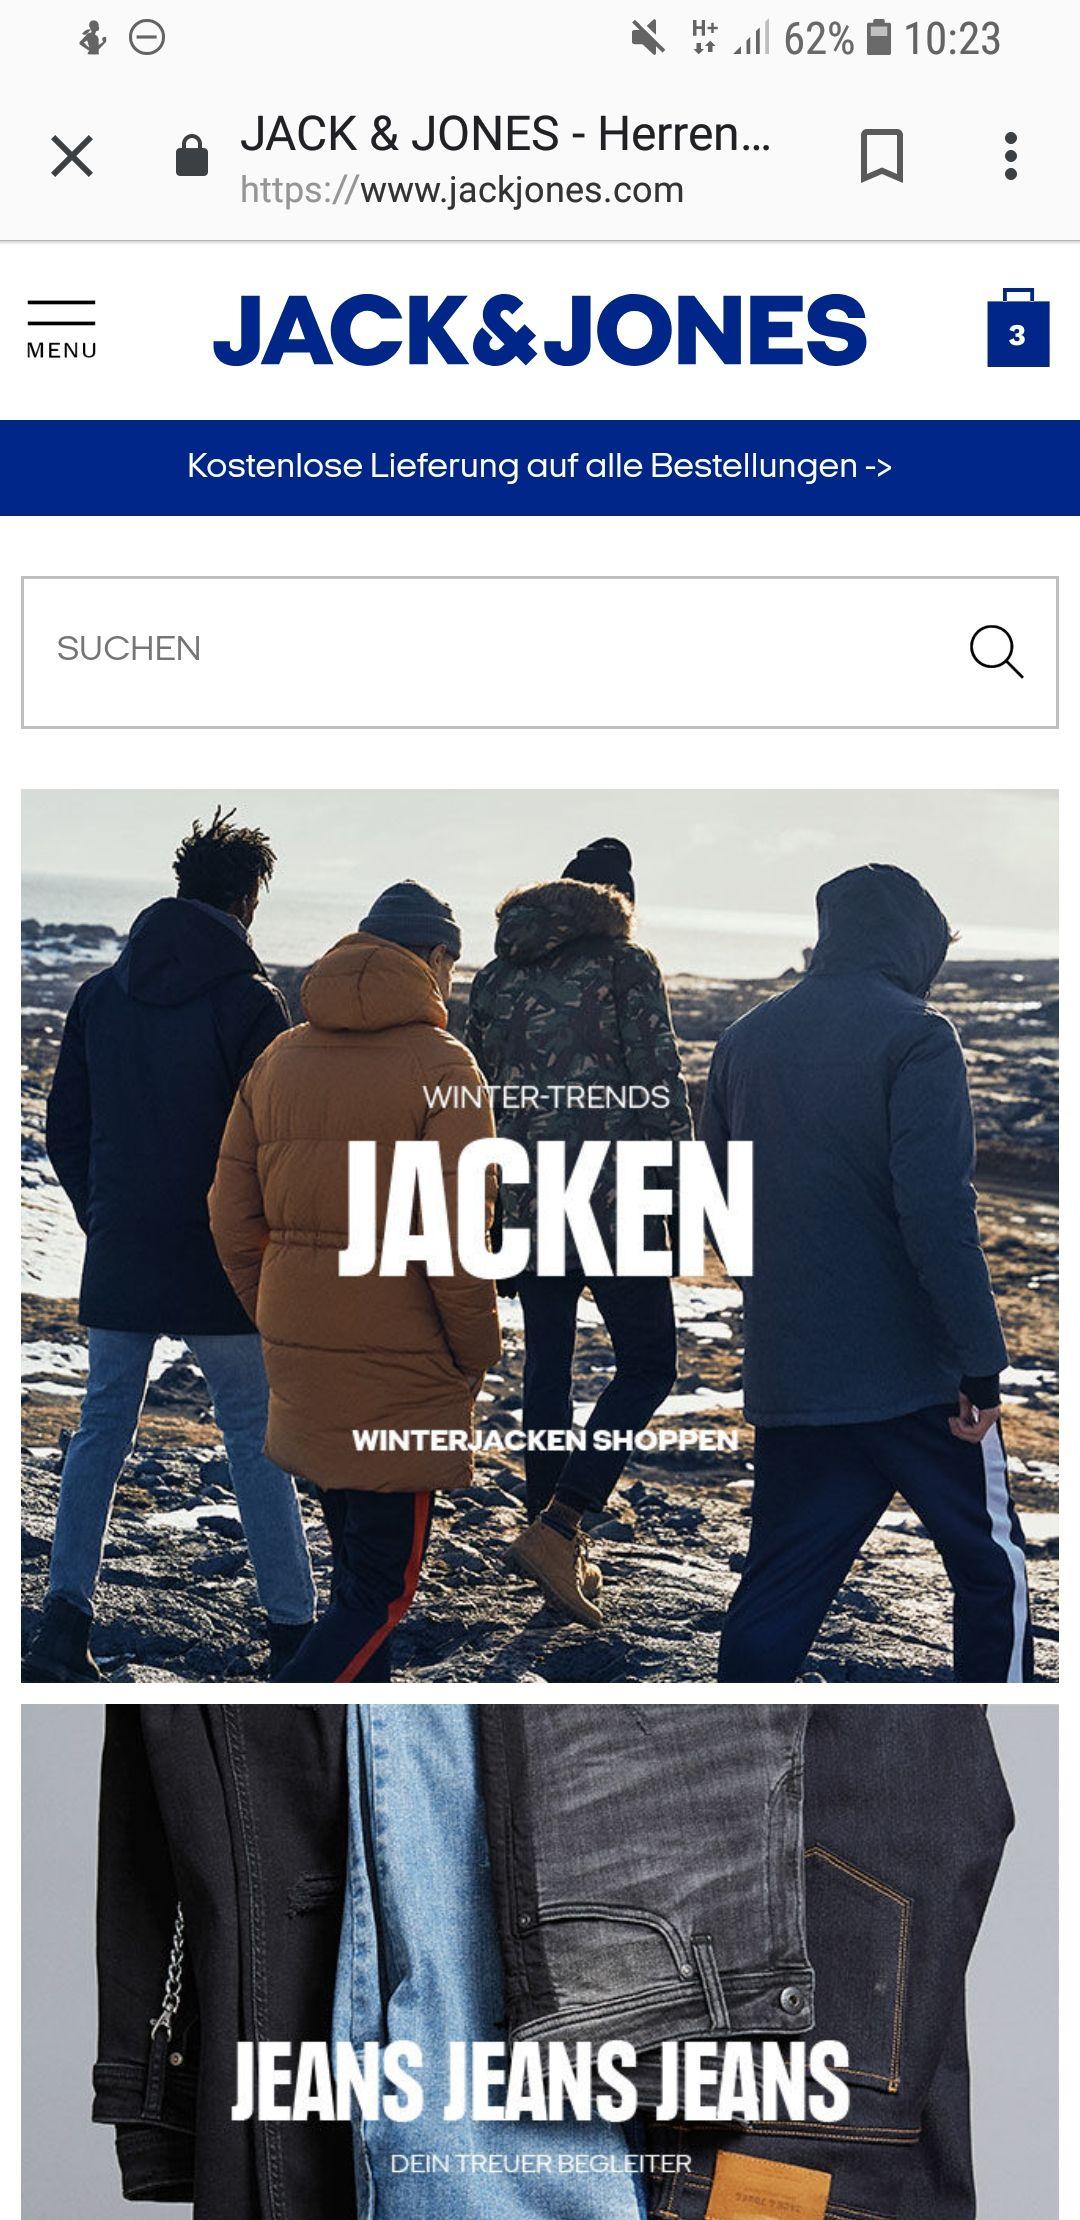 20% bei Jack & Jones online | Kein MBW